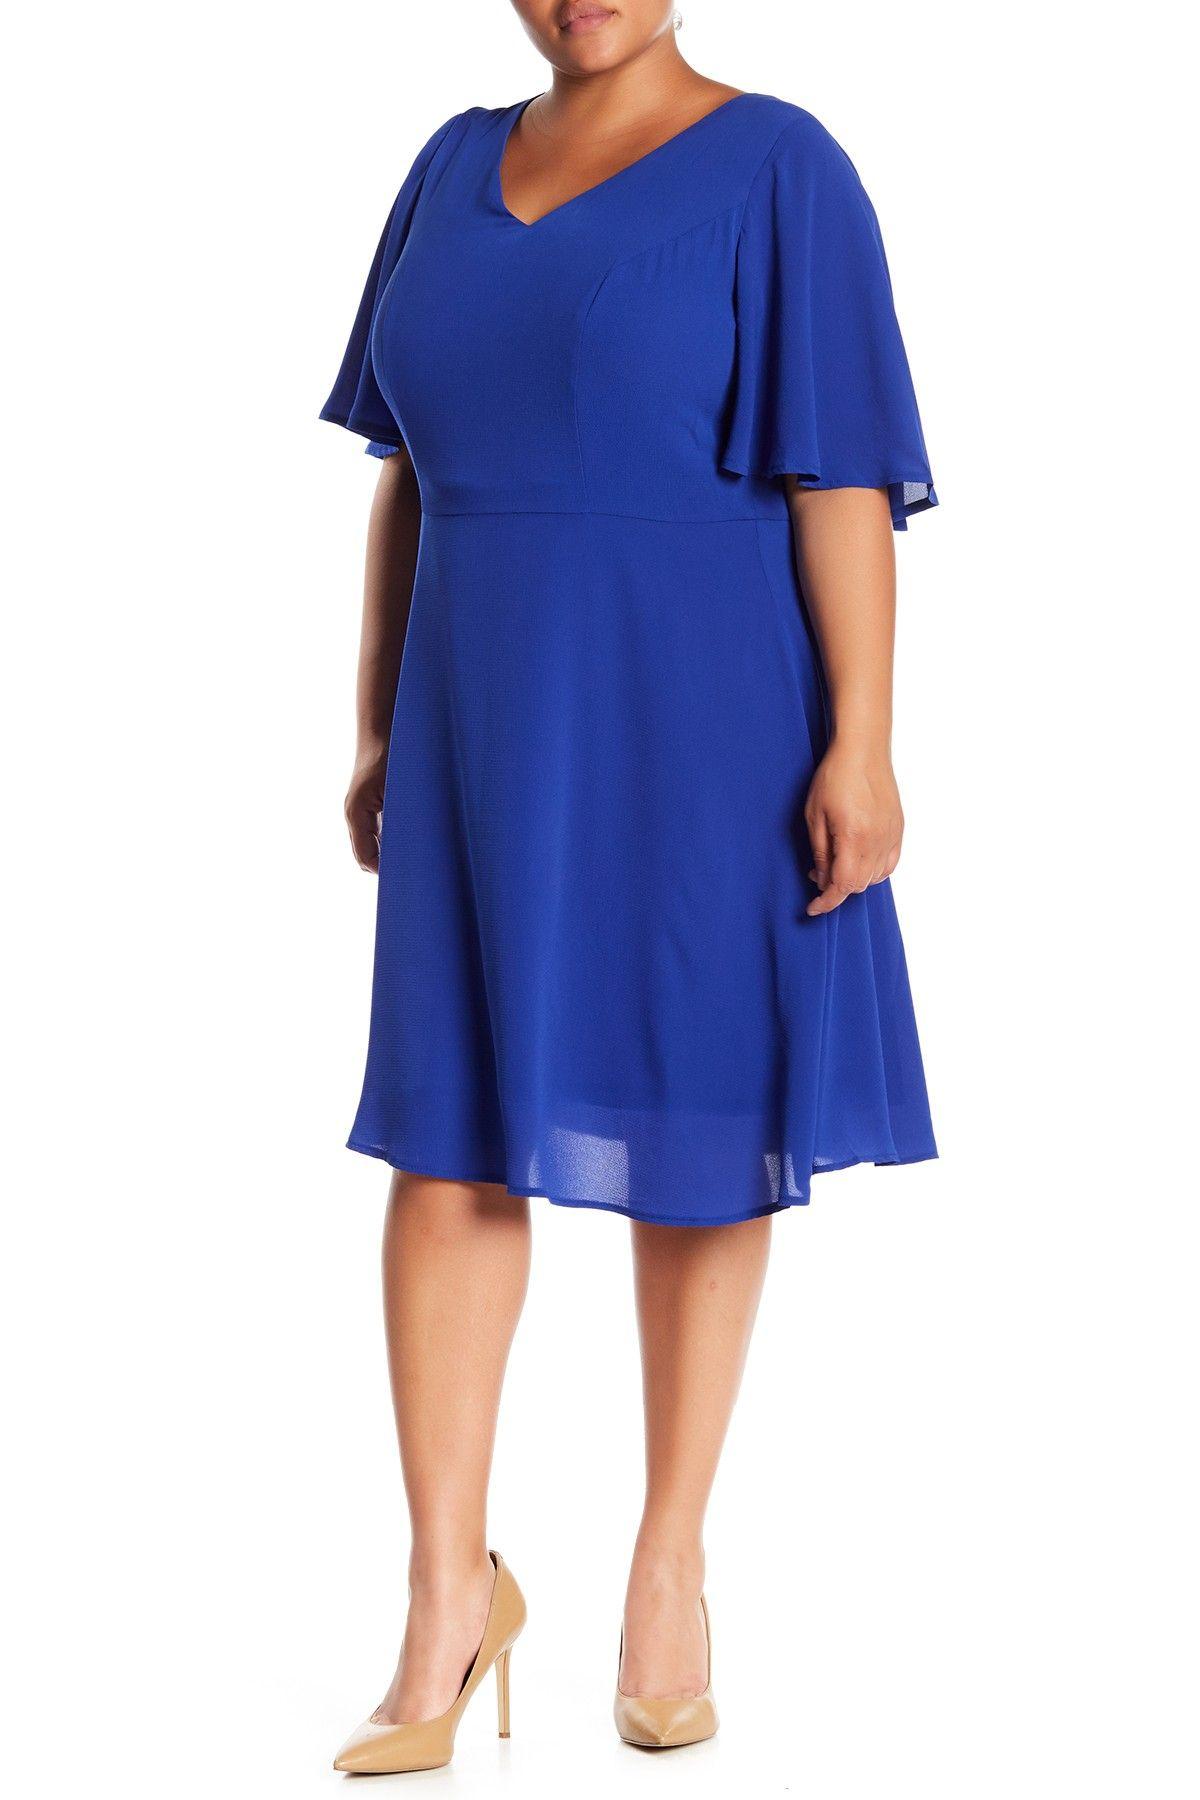 London Times Crepe Fit Flare Dress Plus Size Plus Size Outfits Fit Flare Dress Plus Size Dresses